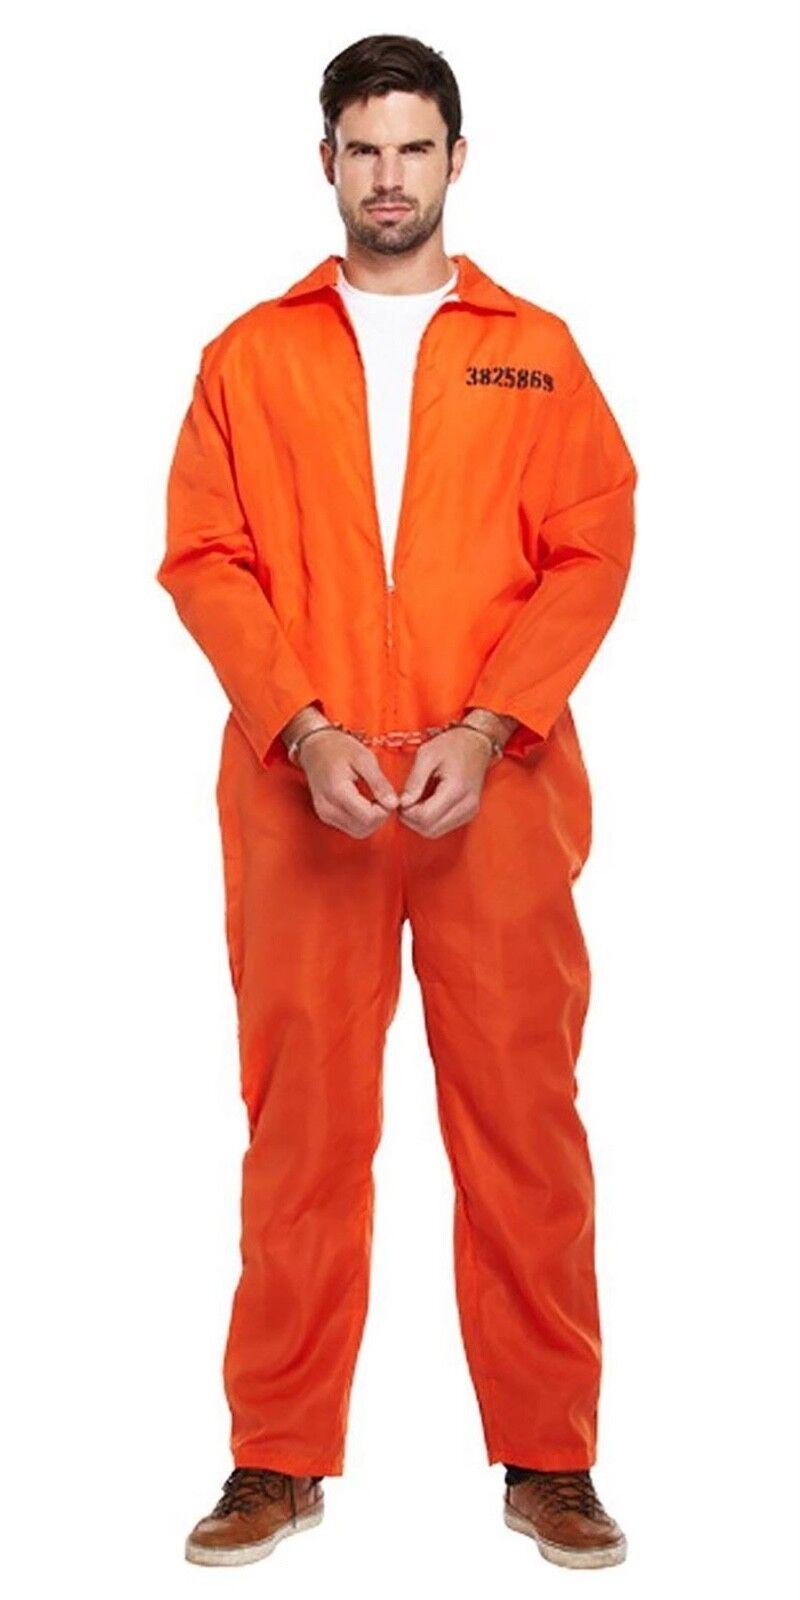 Adults Classic Orange Prisoner Jumpsuit Prison Inmate Fancy Dress Costume Outfit